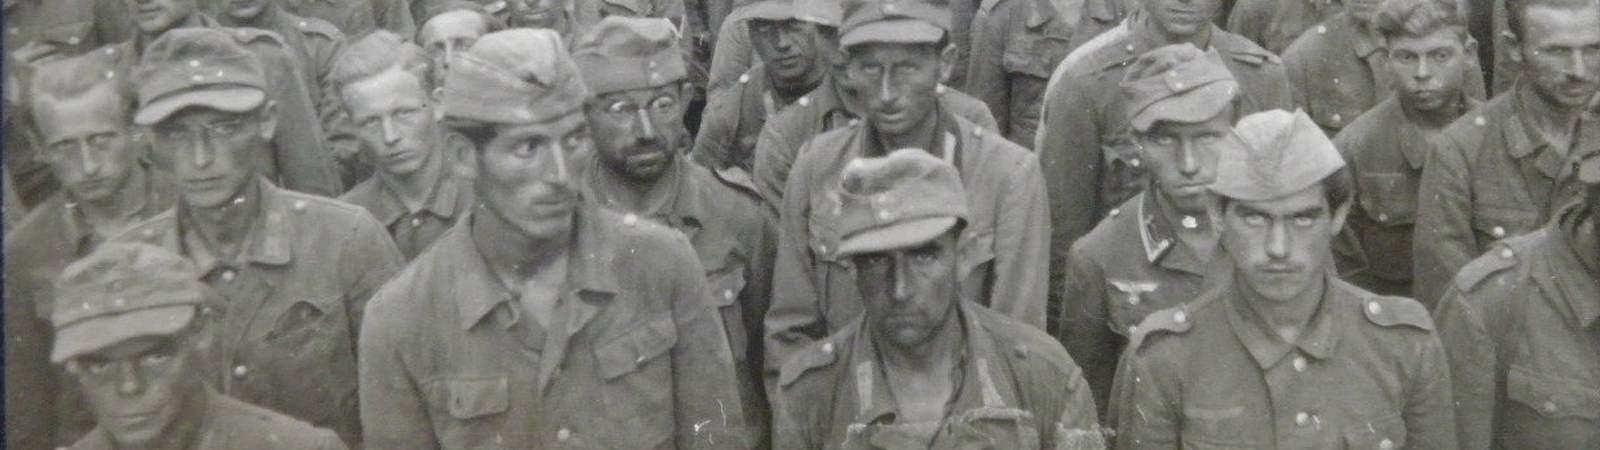 Пленные немцы 1945